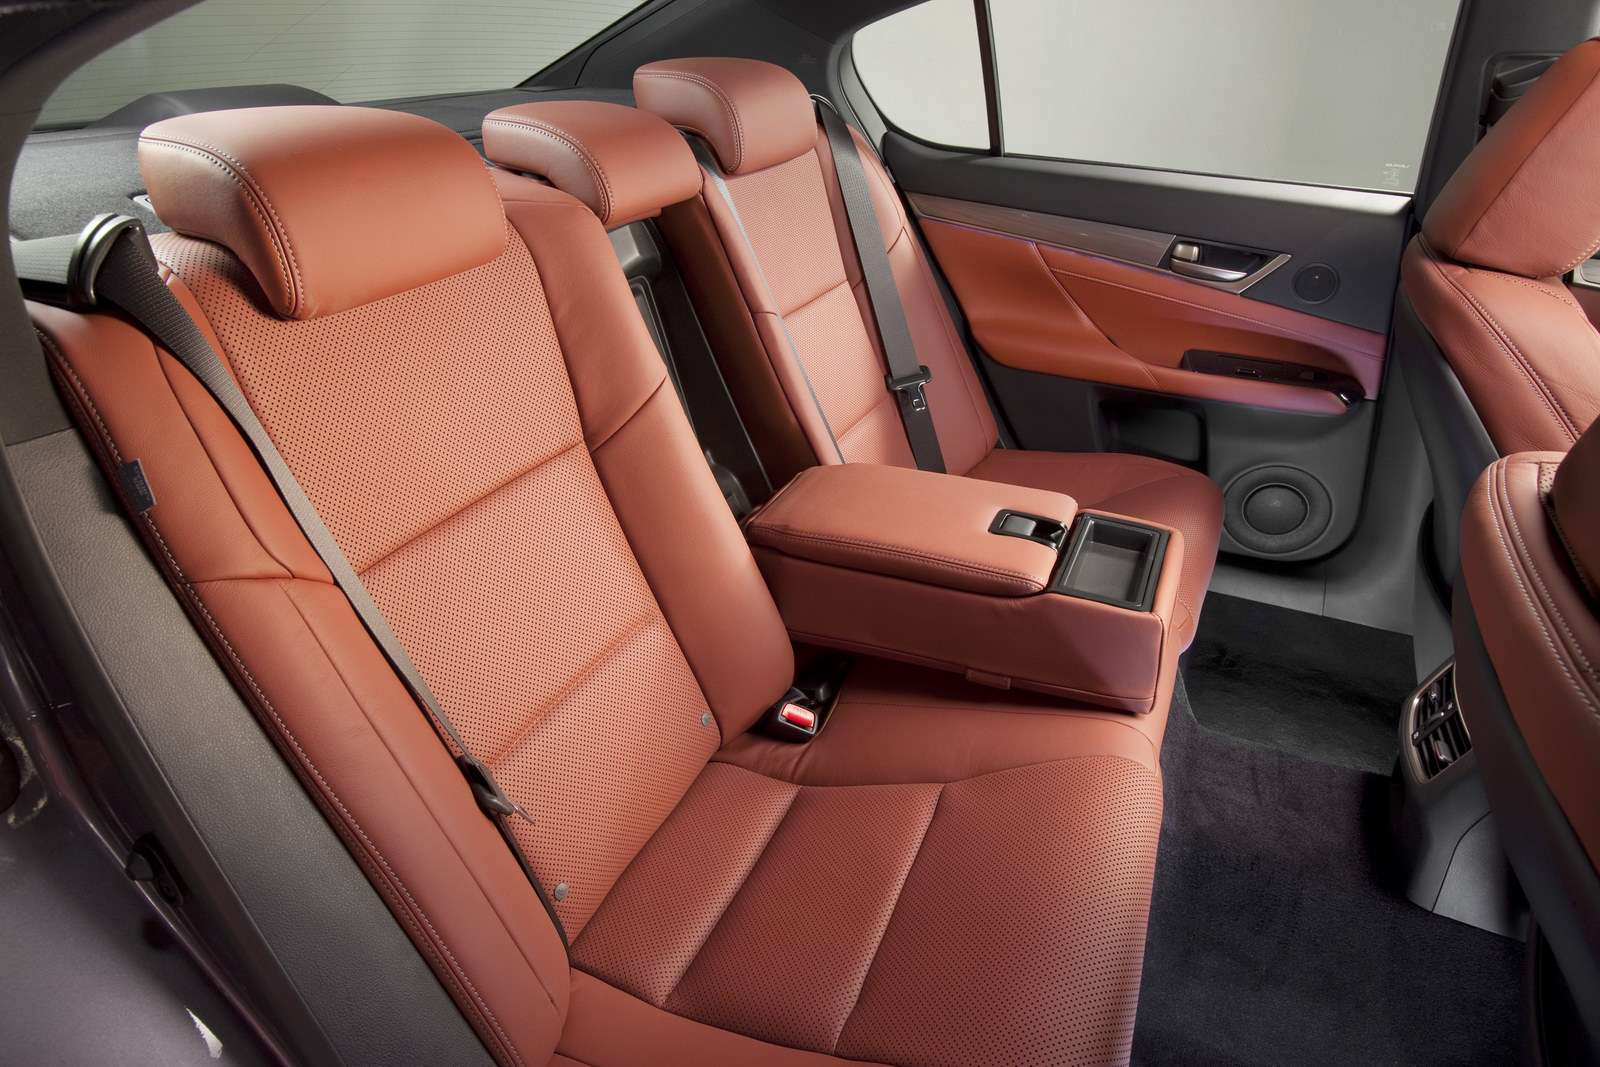 Lexus GS350 F Sport fot pazdziernik 2011